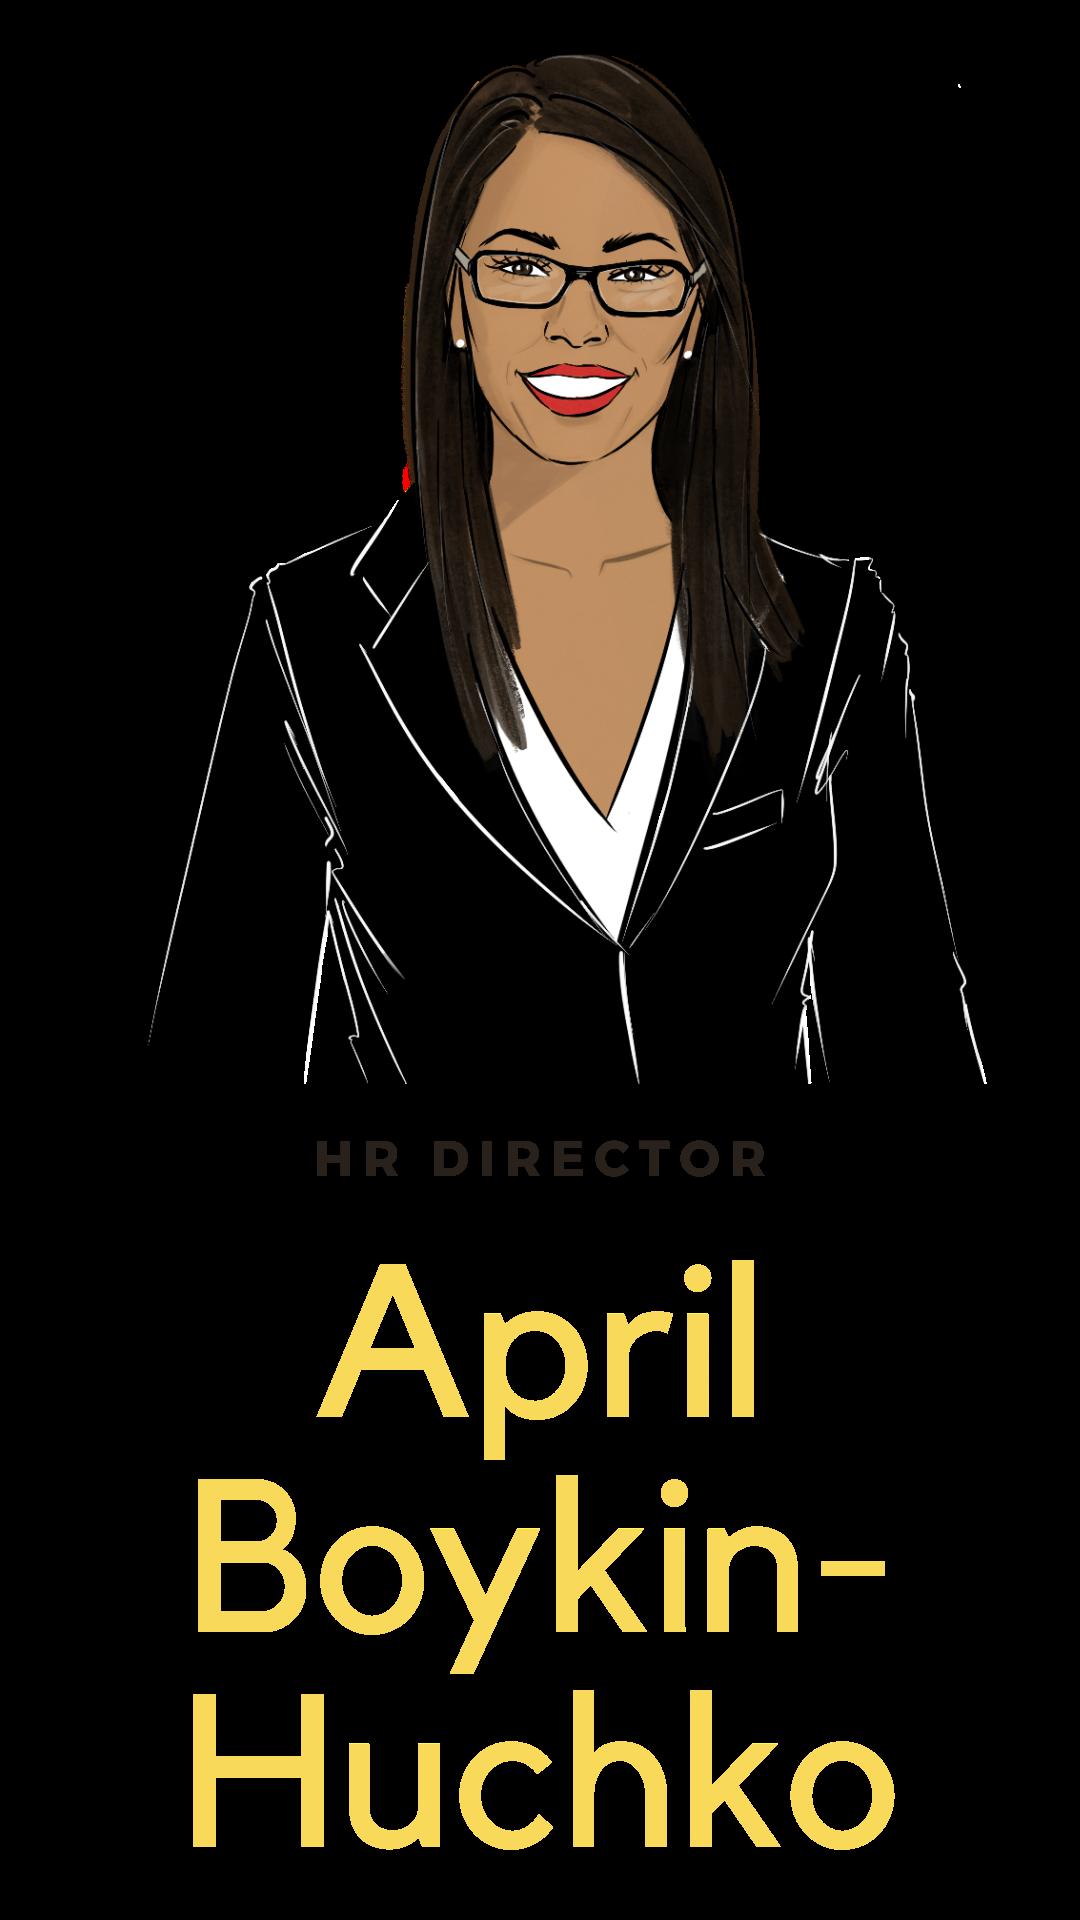 April Boykin huchko